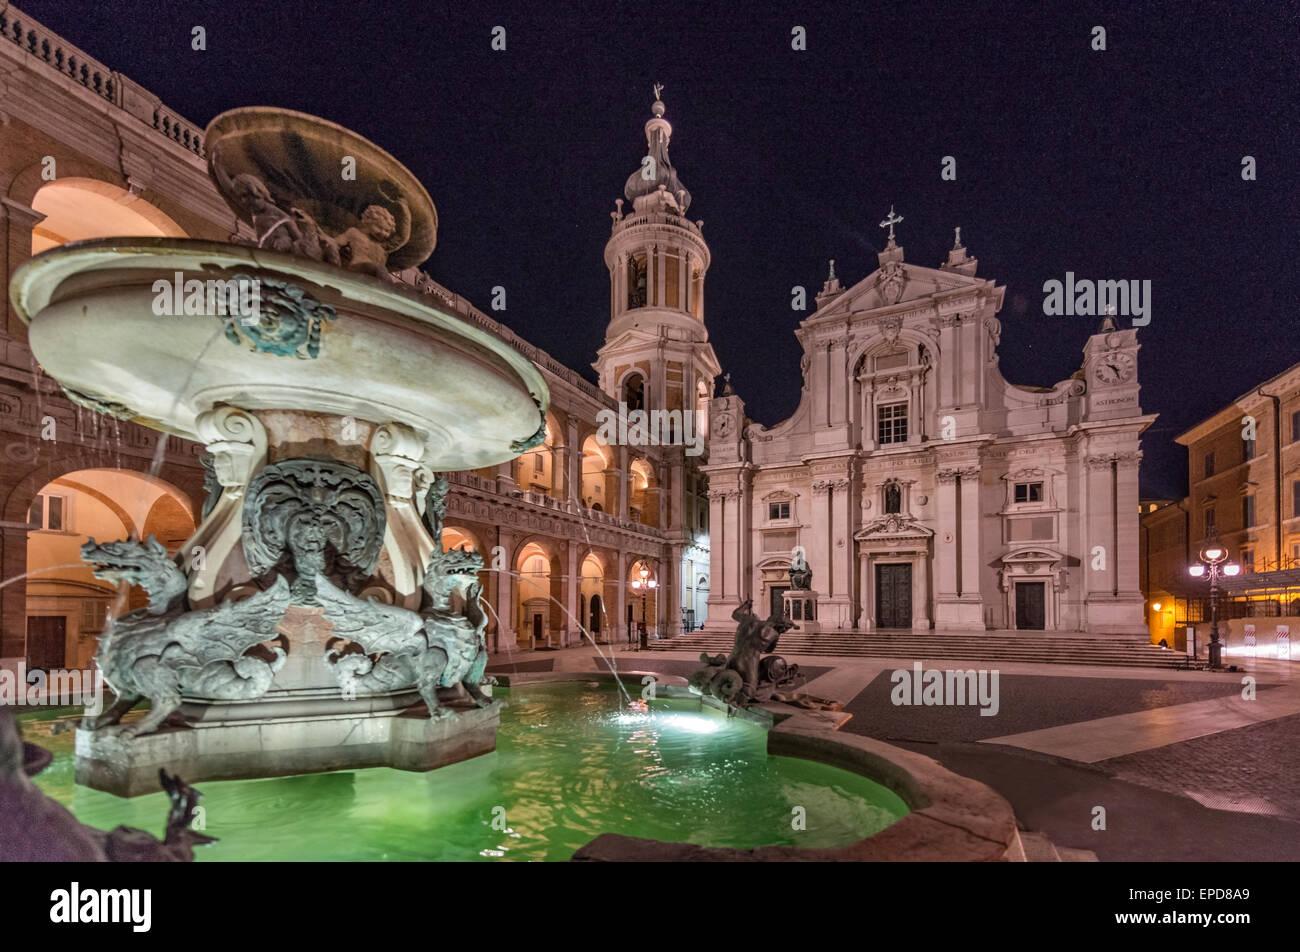 Holy House of Loreto by night, Loreto, Conero, Marche district, Italy - Stock Image